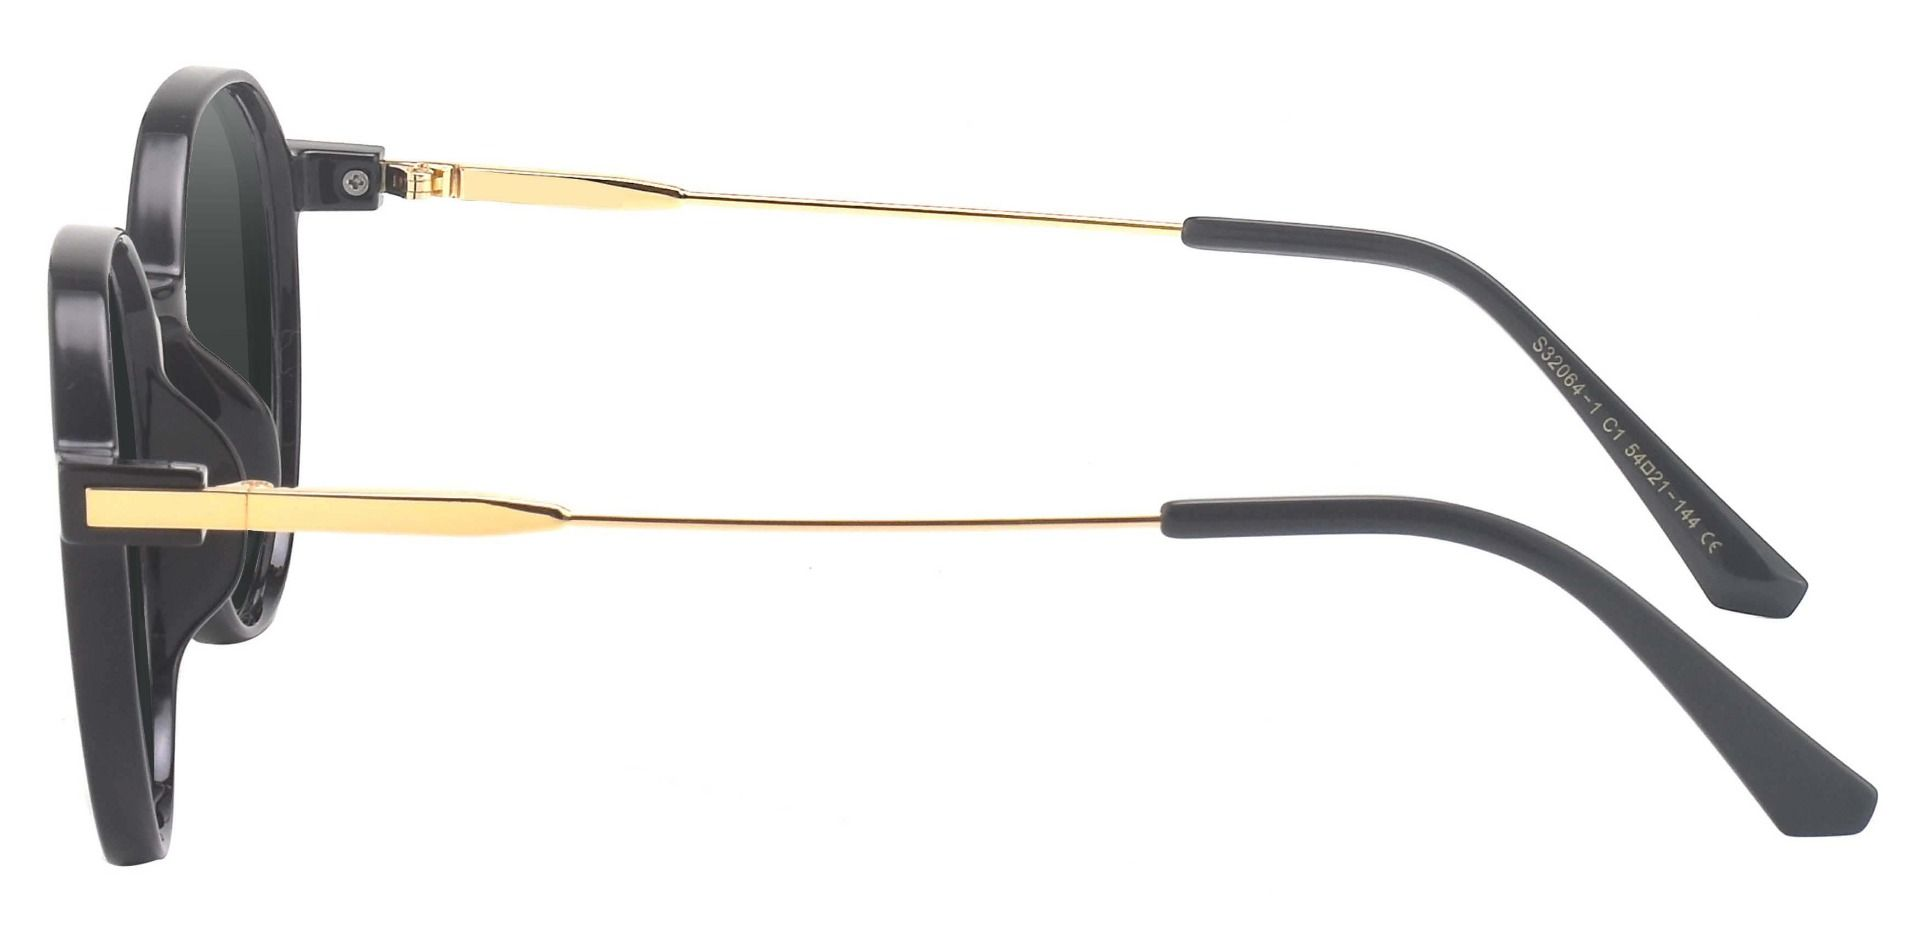 Daytona Geometric Reading Sunglasses - Black Frame With Gray Lenses